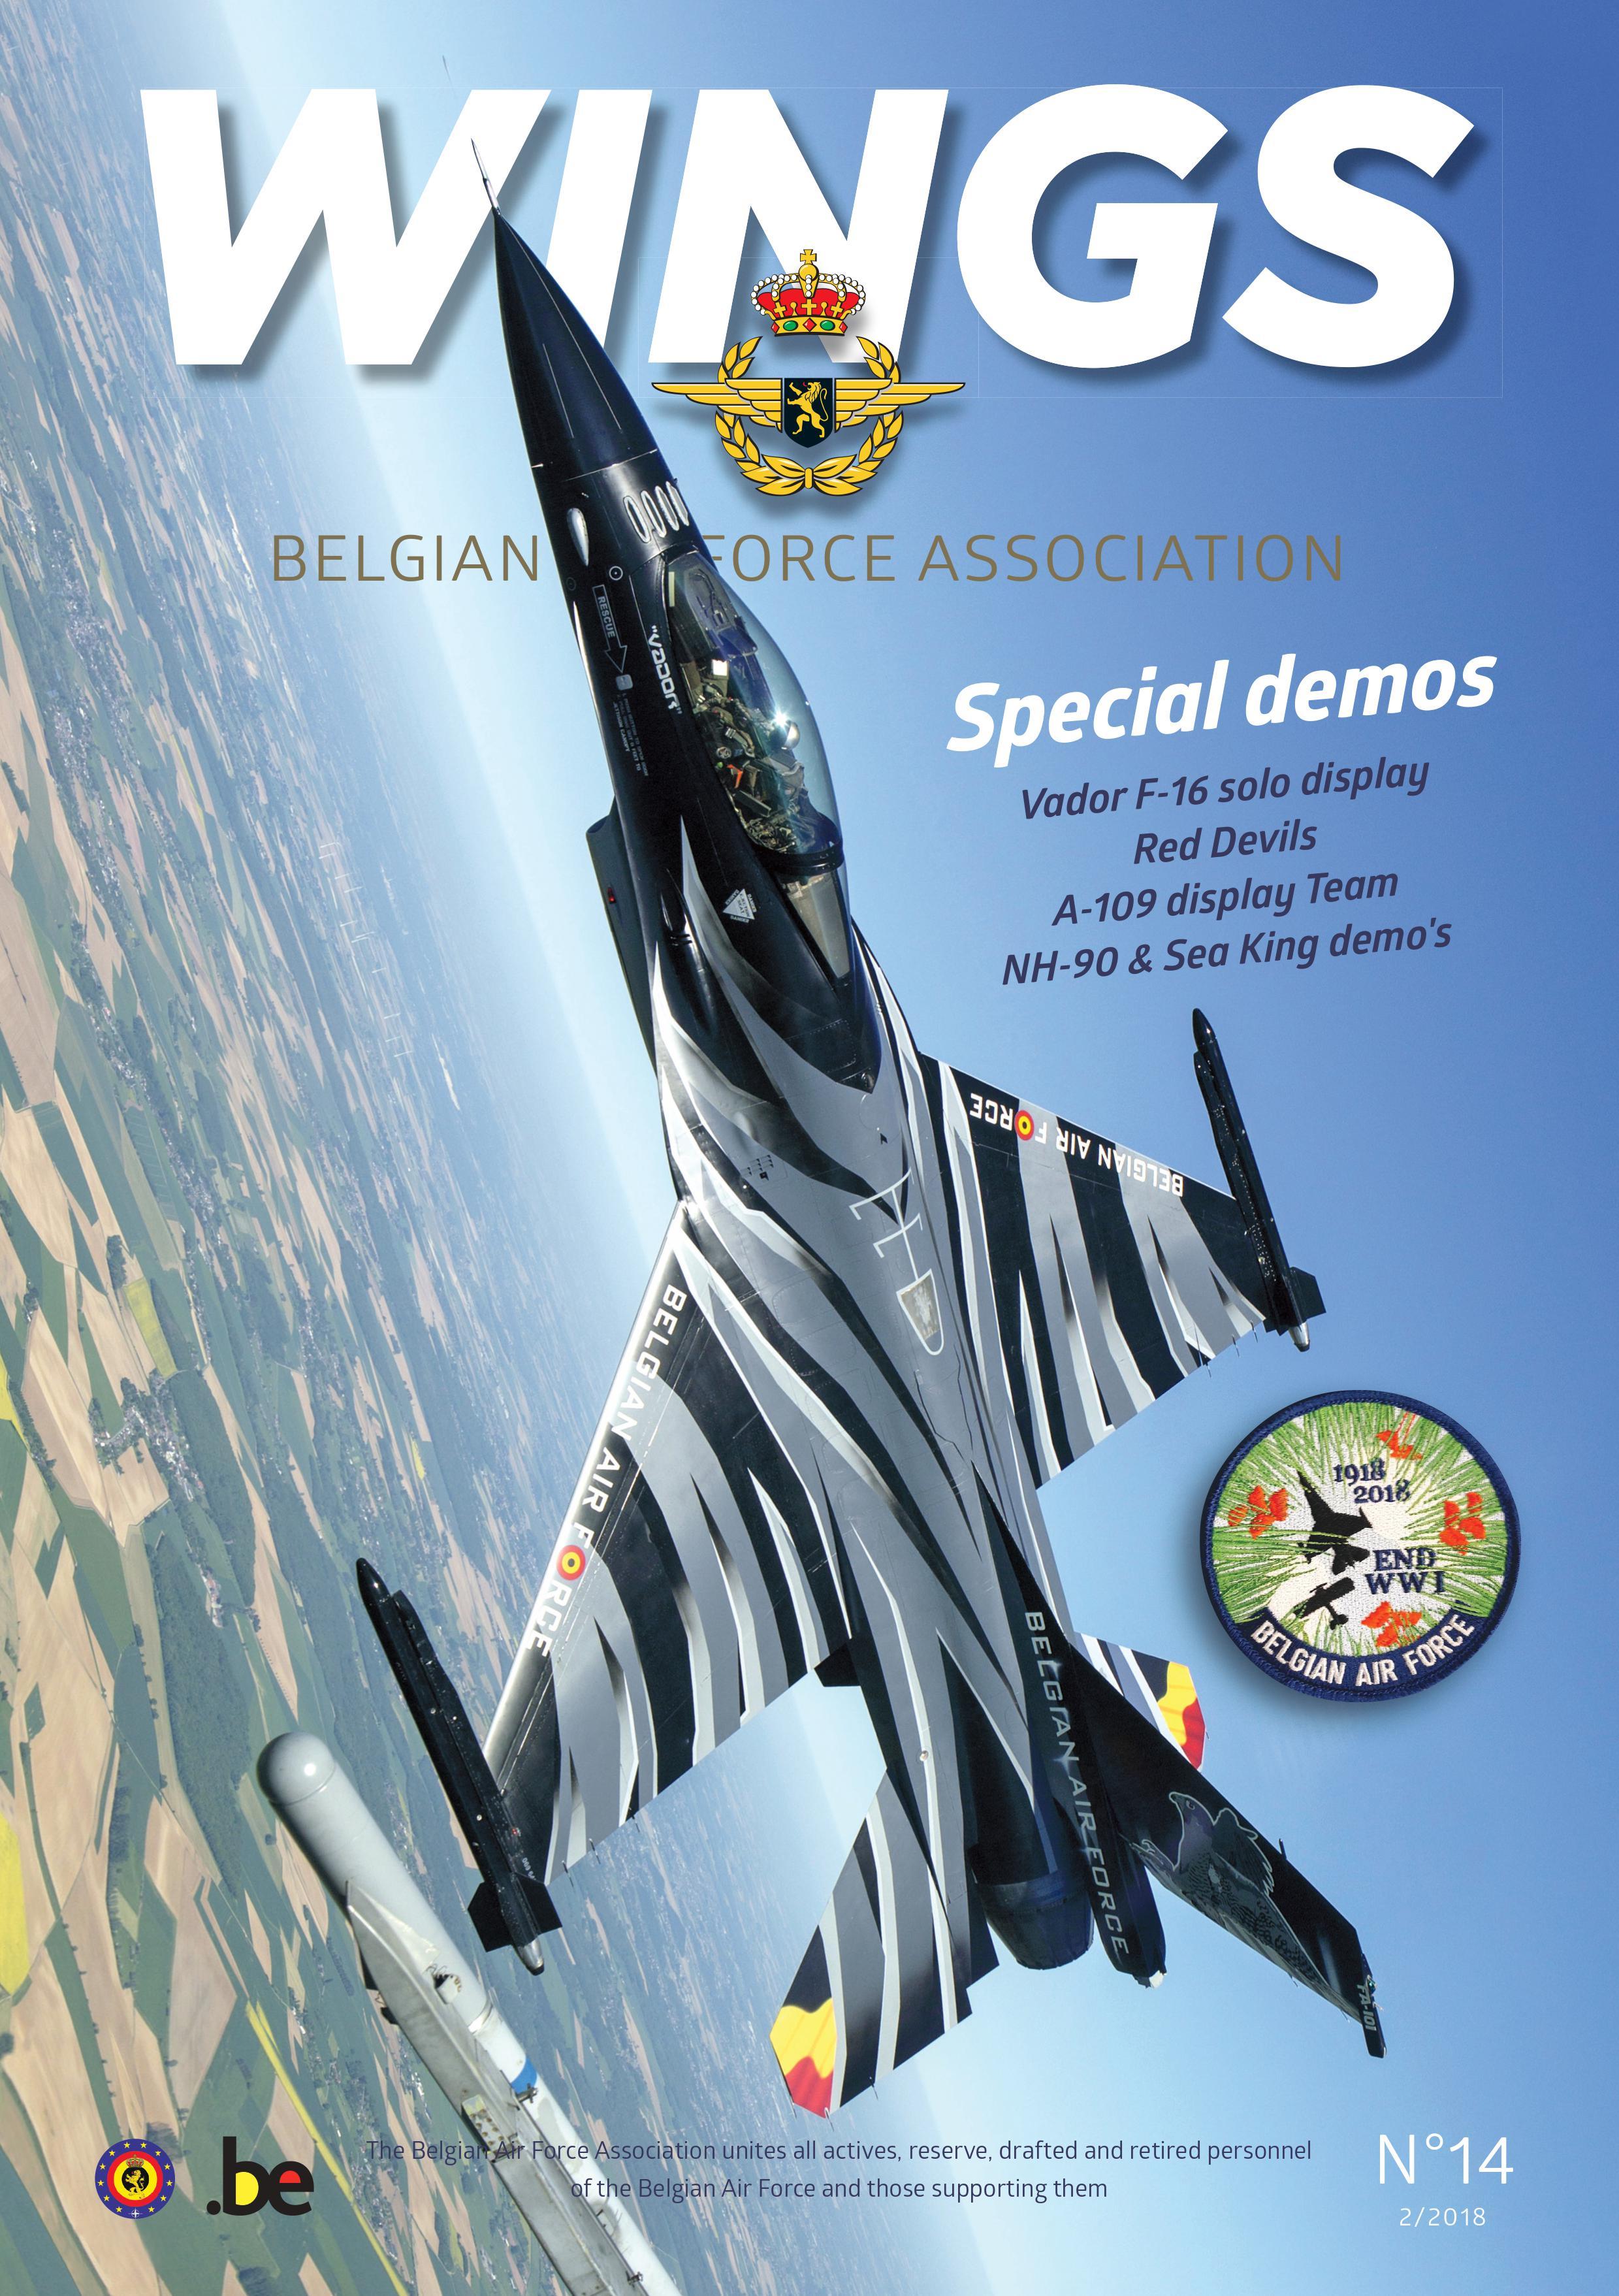 Wings 14 - Belgian Air Force Association